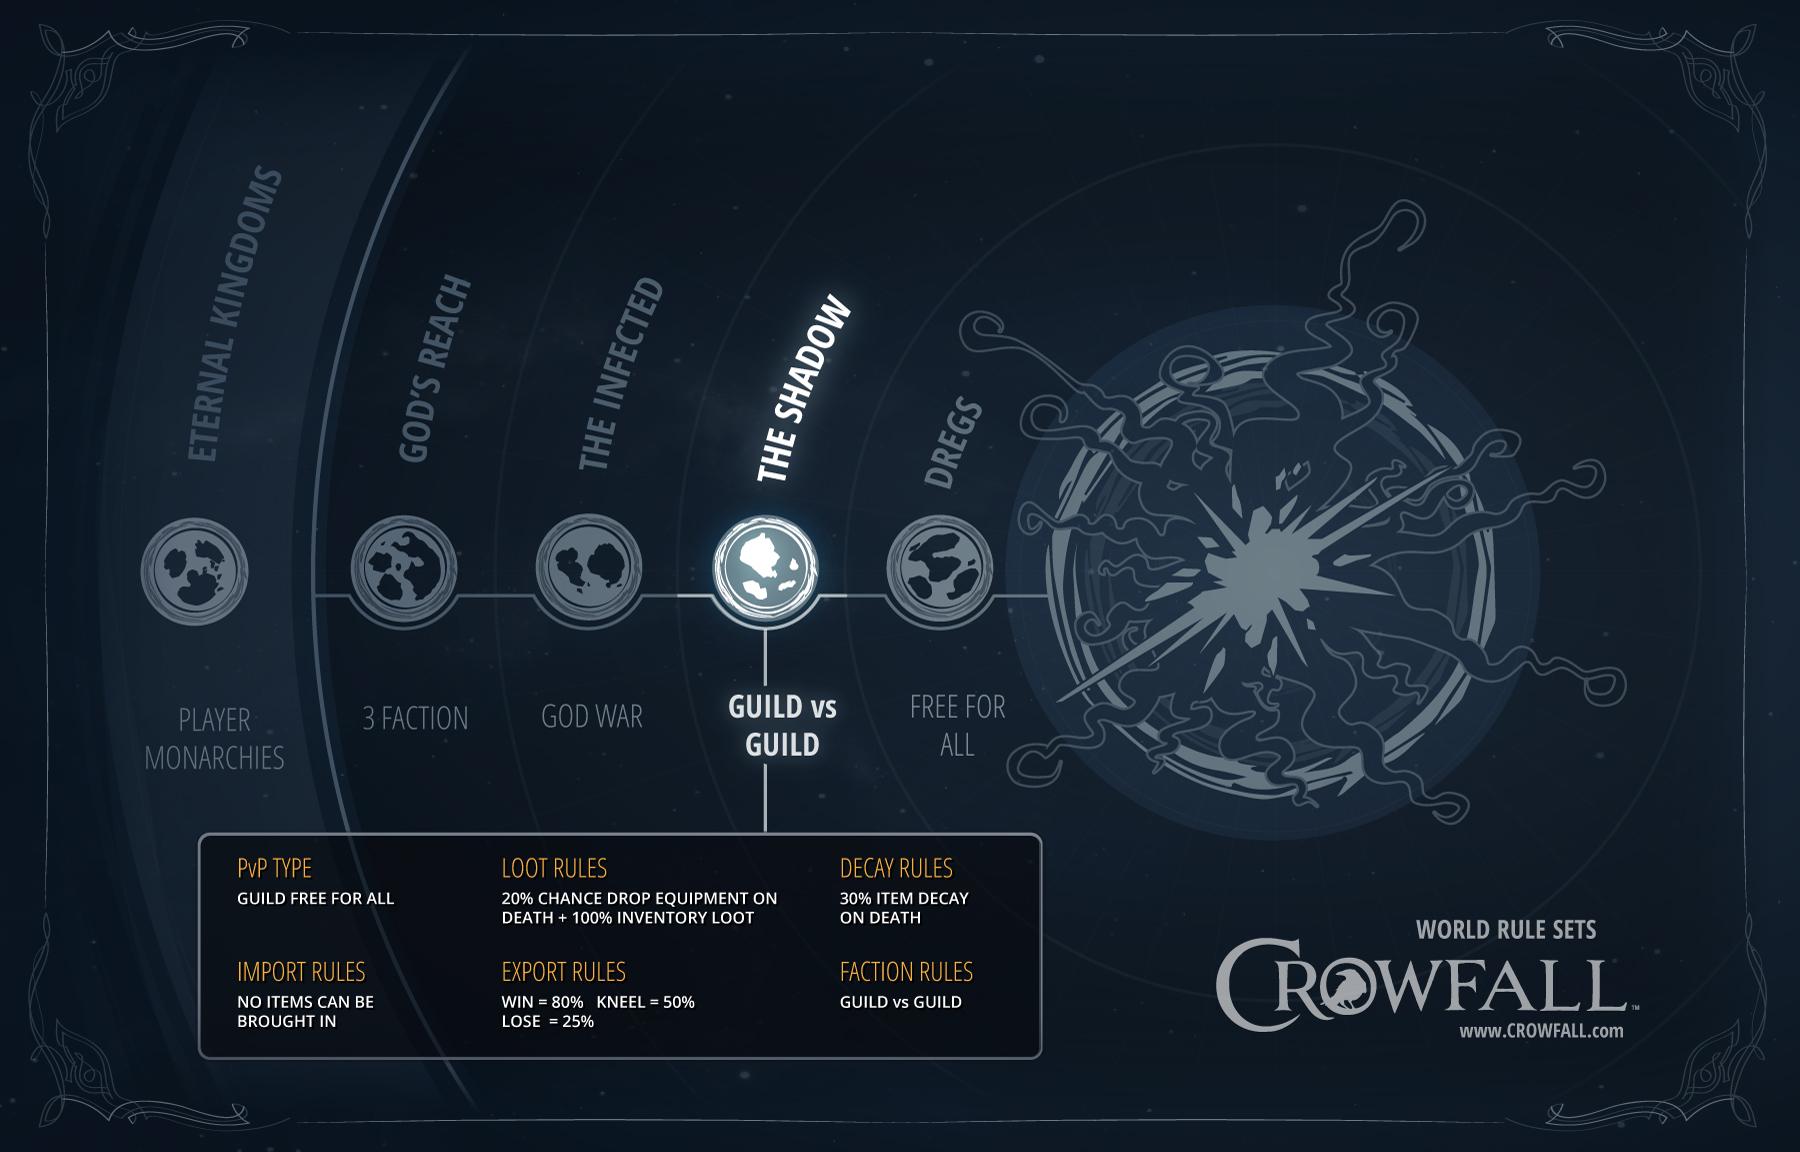 Crowfall_WorldRules_1.jpg